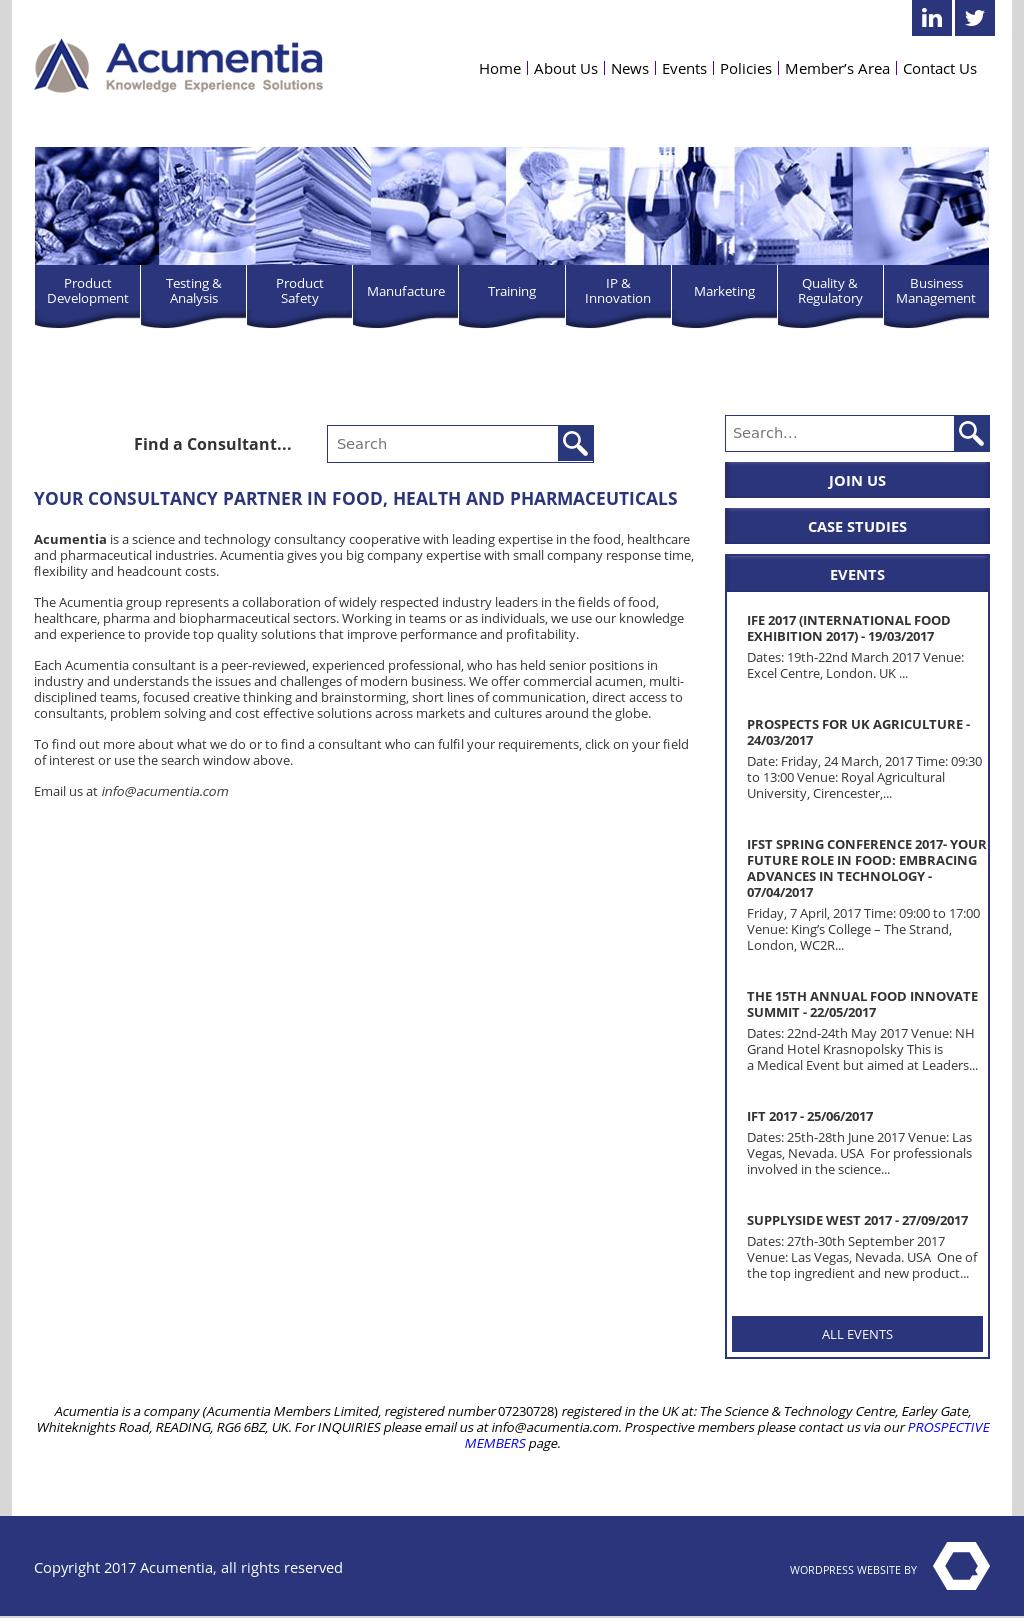 Acumentia Competitors, Revenue and Employees - Owler Company Profile